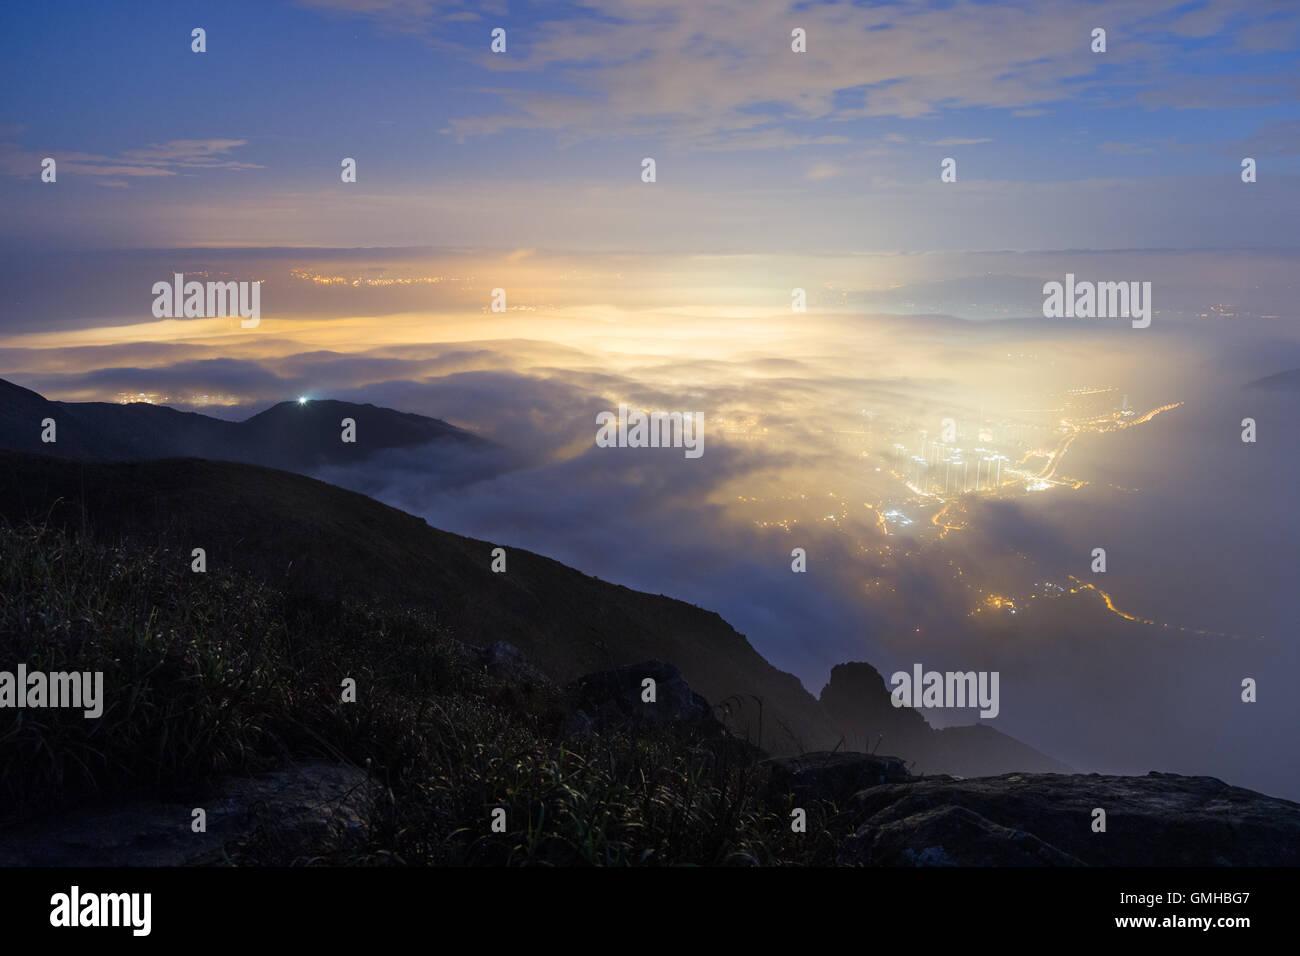 Lights of Tung Chung New Town below clouds on Lantau Island, viewed from the Lantau Peak in Hong Kong, China. - Stock Image